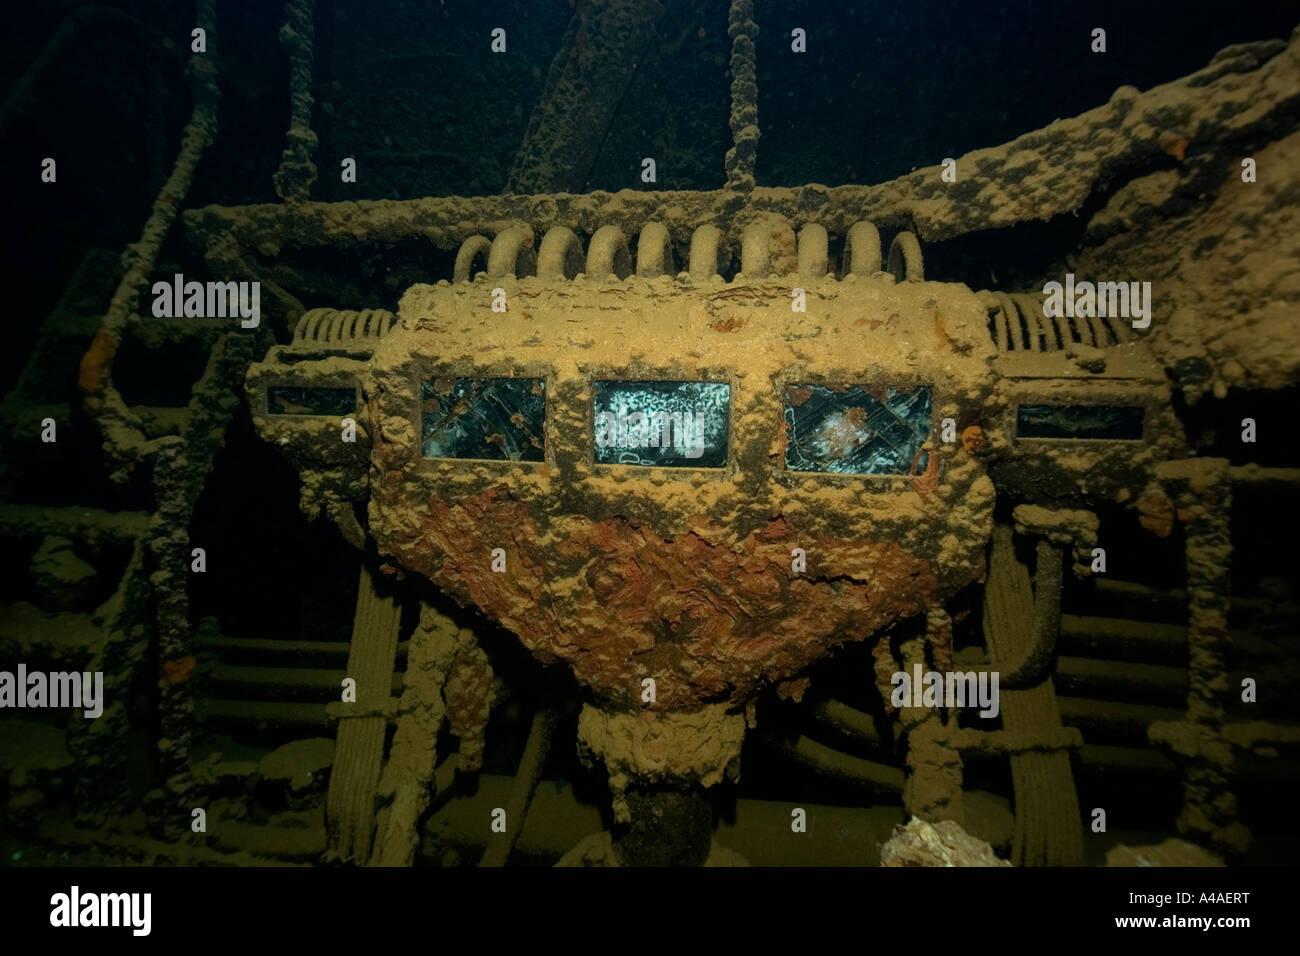 Engine room shinkoku maru truk lagoon chuuk federated states of micronesia pacific